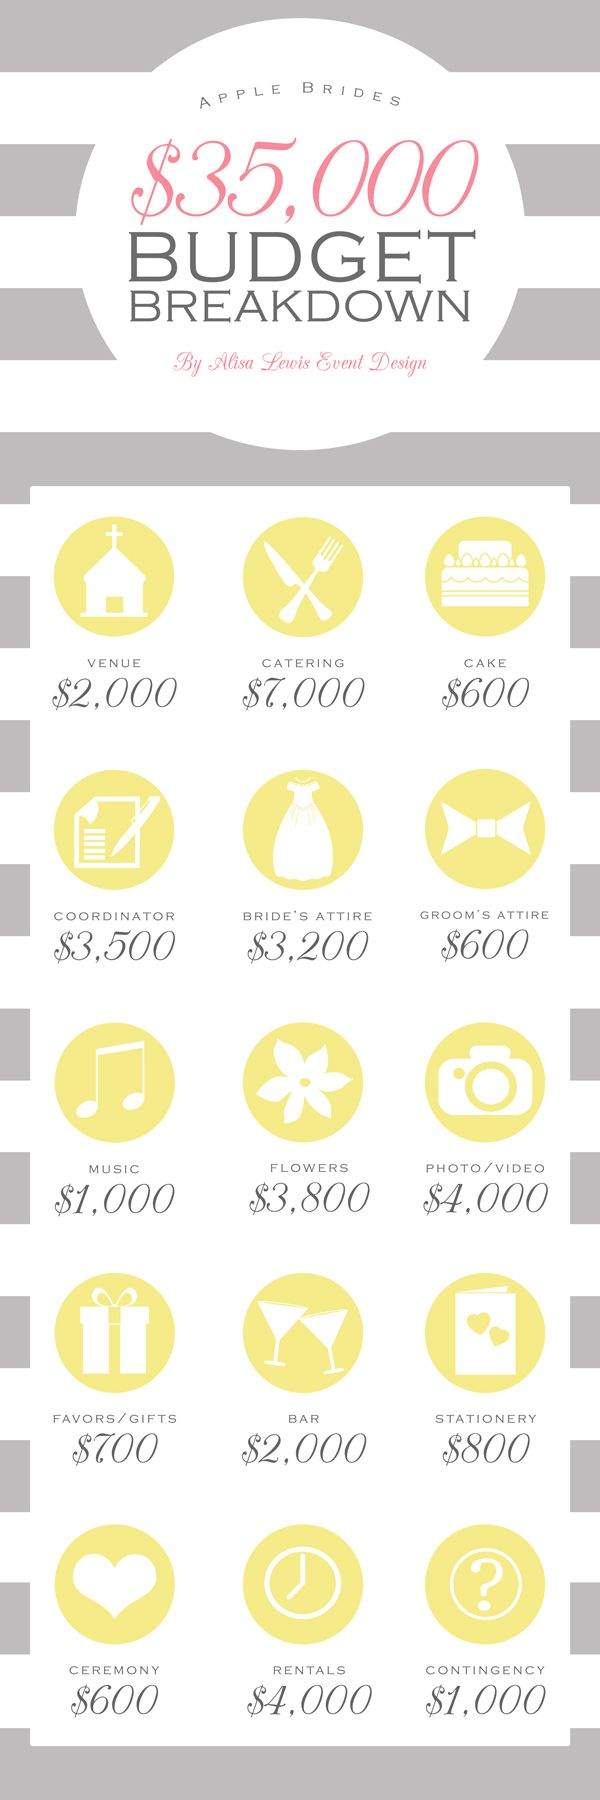 Budget Breakdown For A 35000 Wedding